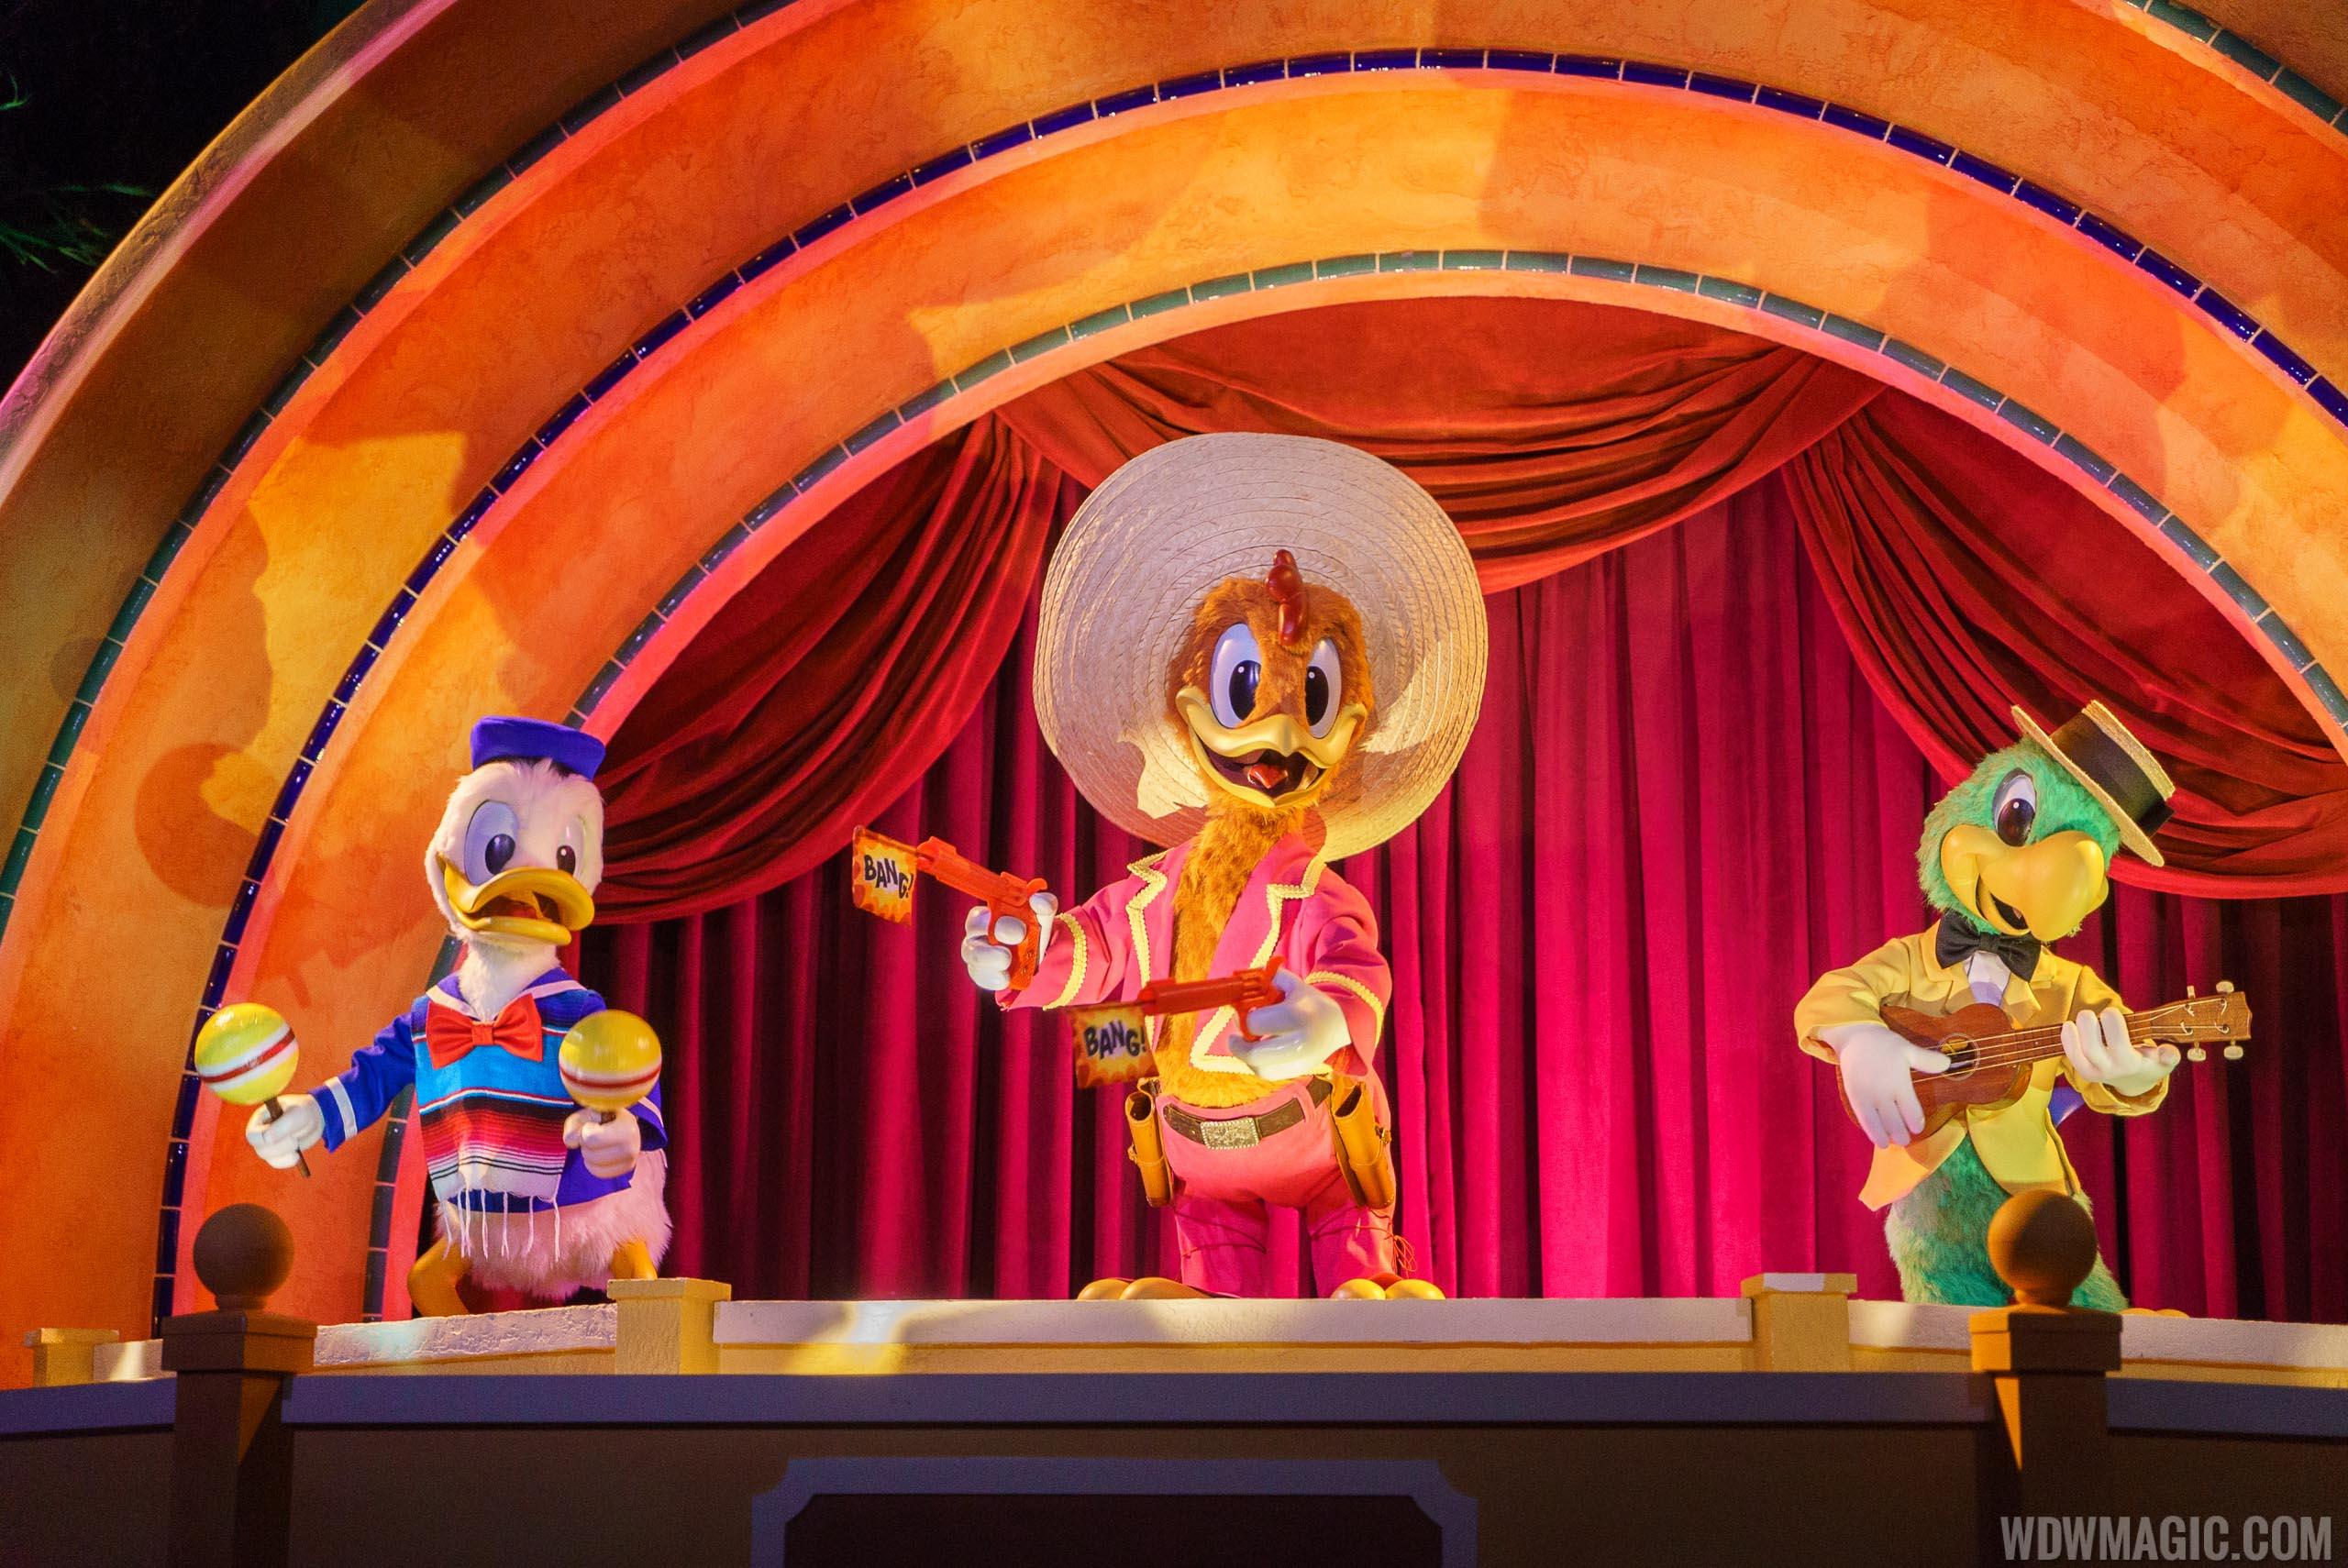 Gran-Fiesta-Tour-Starring-The-Three-Caballeros_Full_26131.jpg